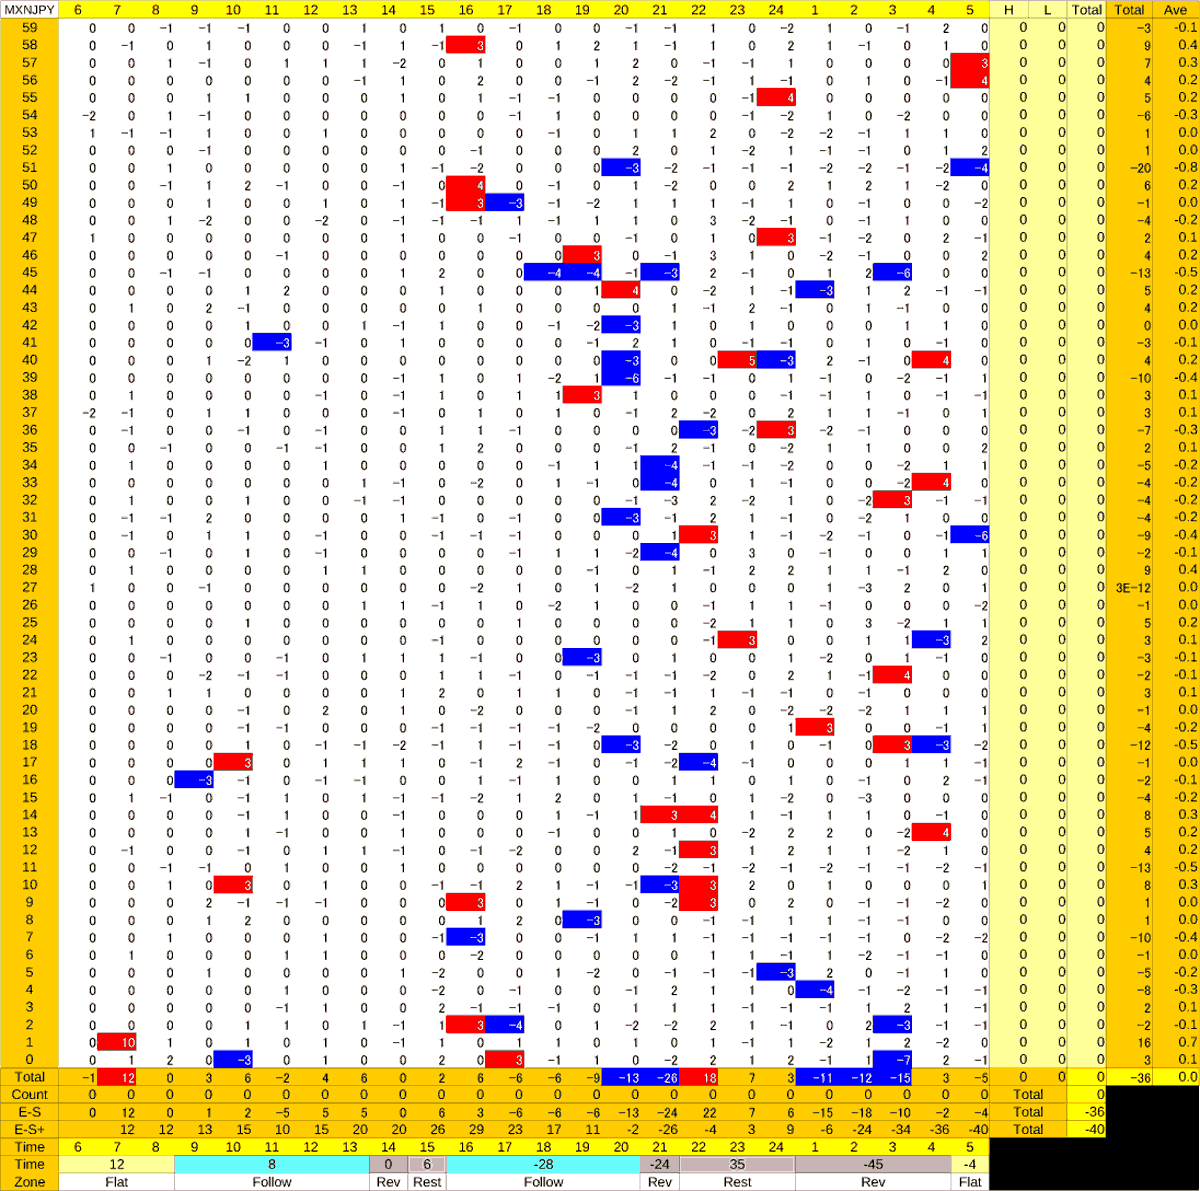 20200723_HS(3)MXNJPY